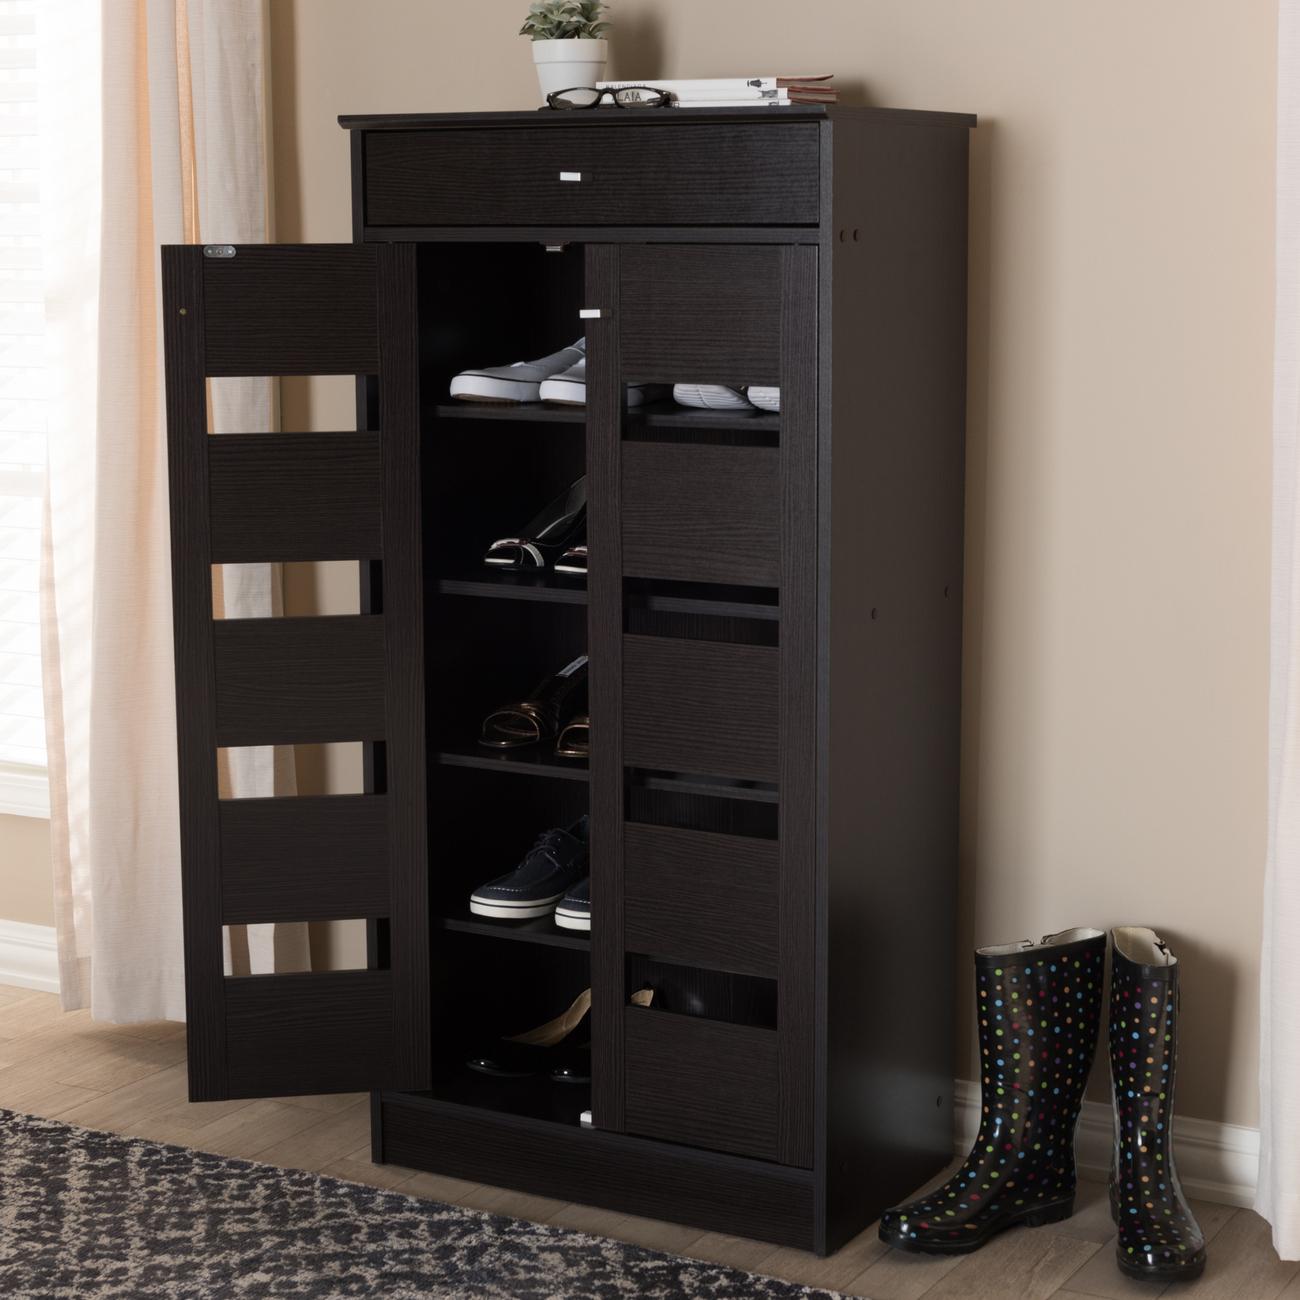 Baxton Studio Acadia Modern & Contemporary Wenge Brown Finished Shoe Cabinet - MH27202-Wenge-Shoe Rack